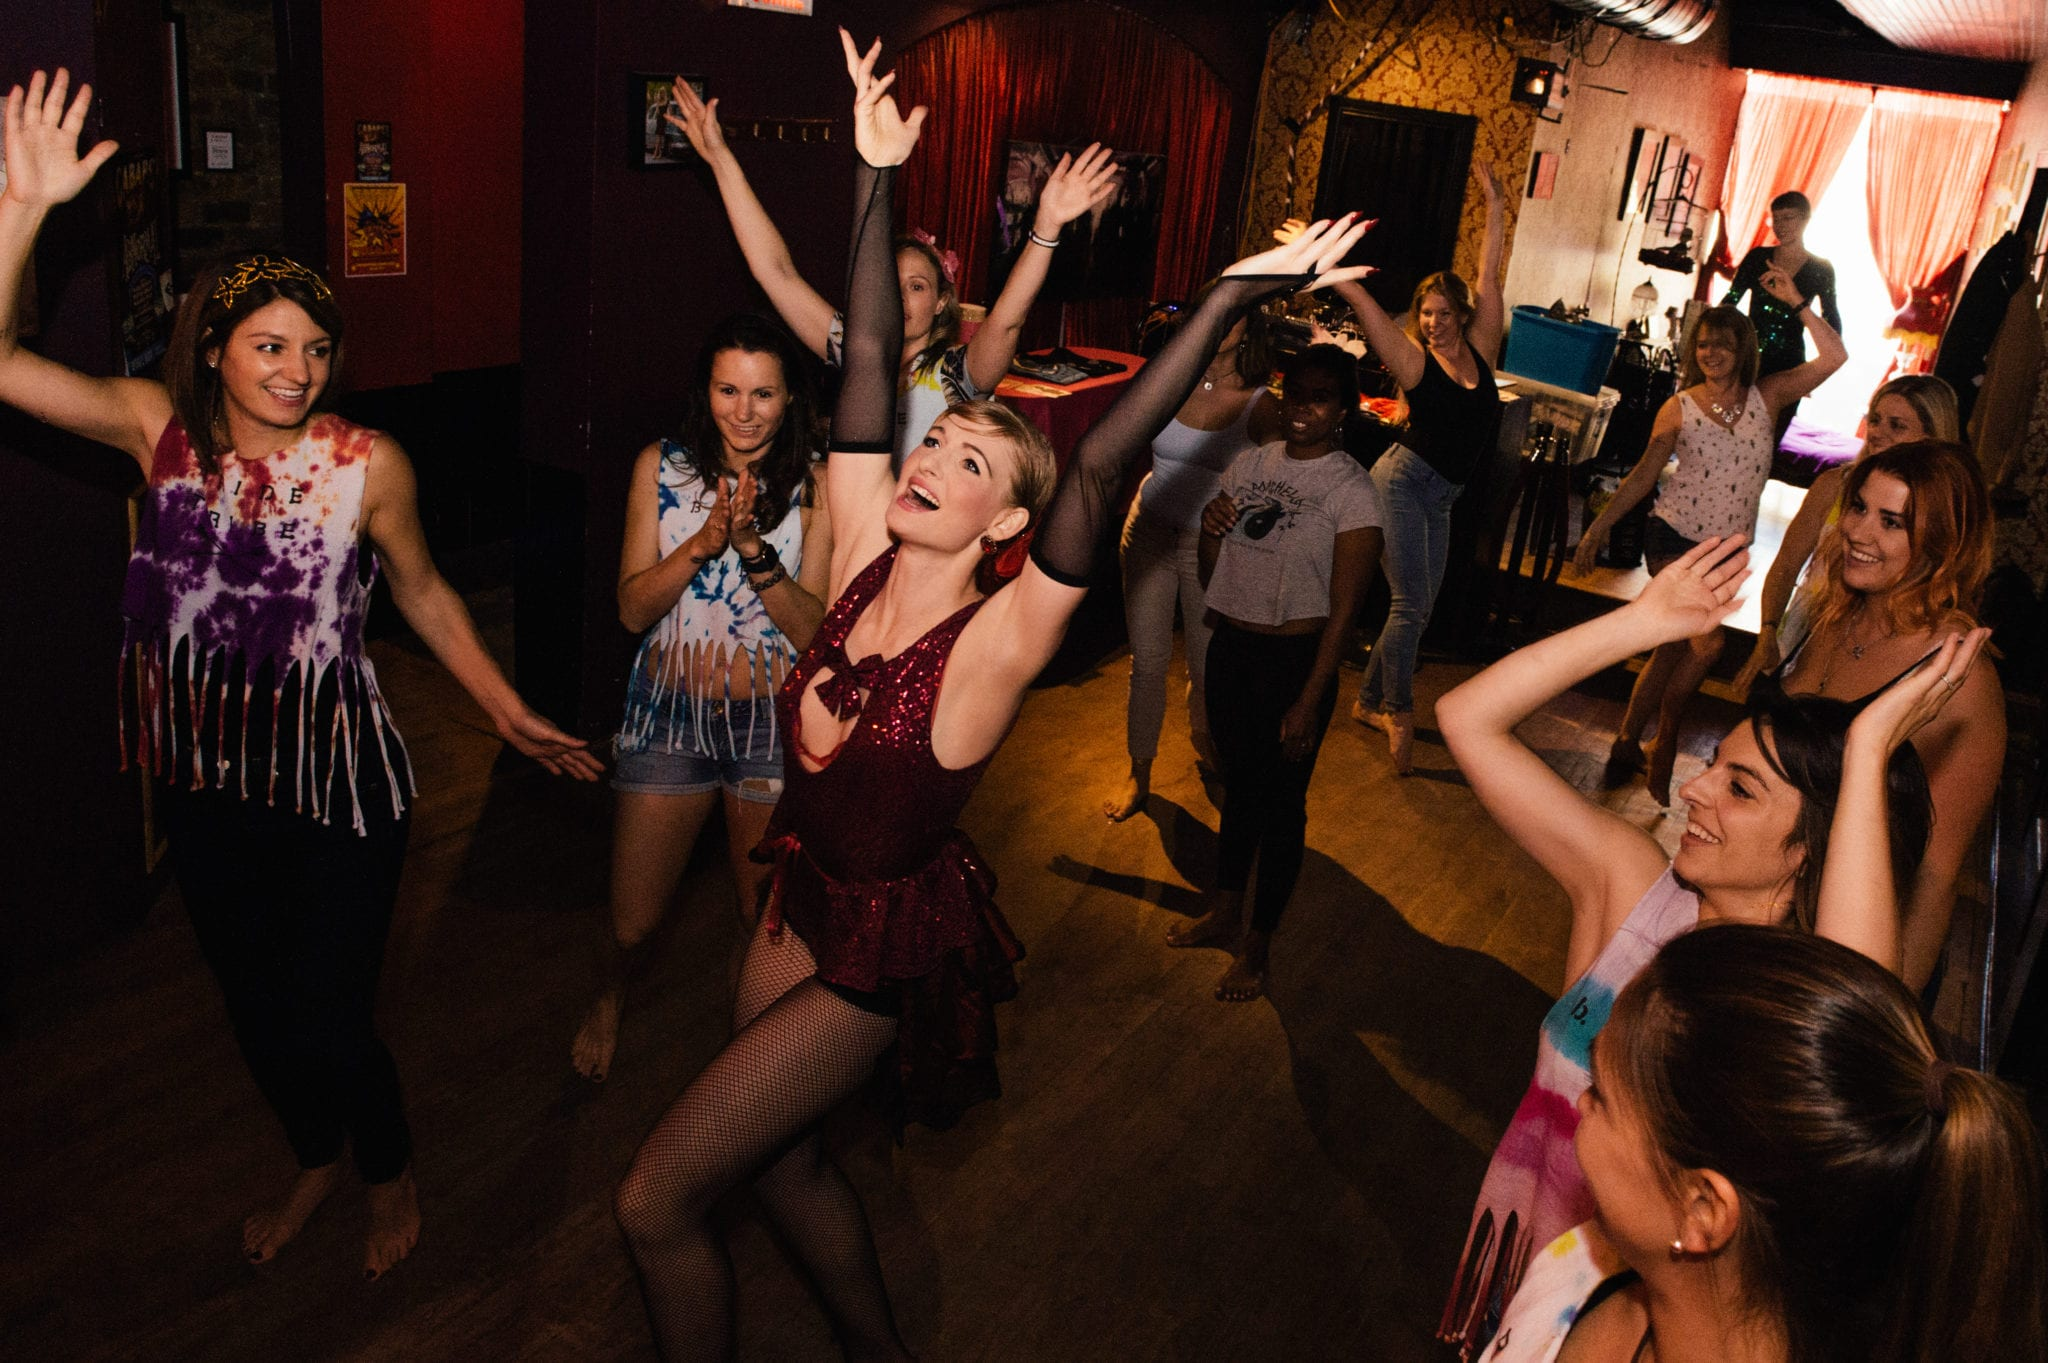 Photo courtesy of Arabesque Burlesque